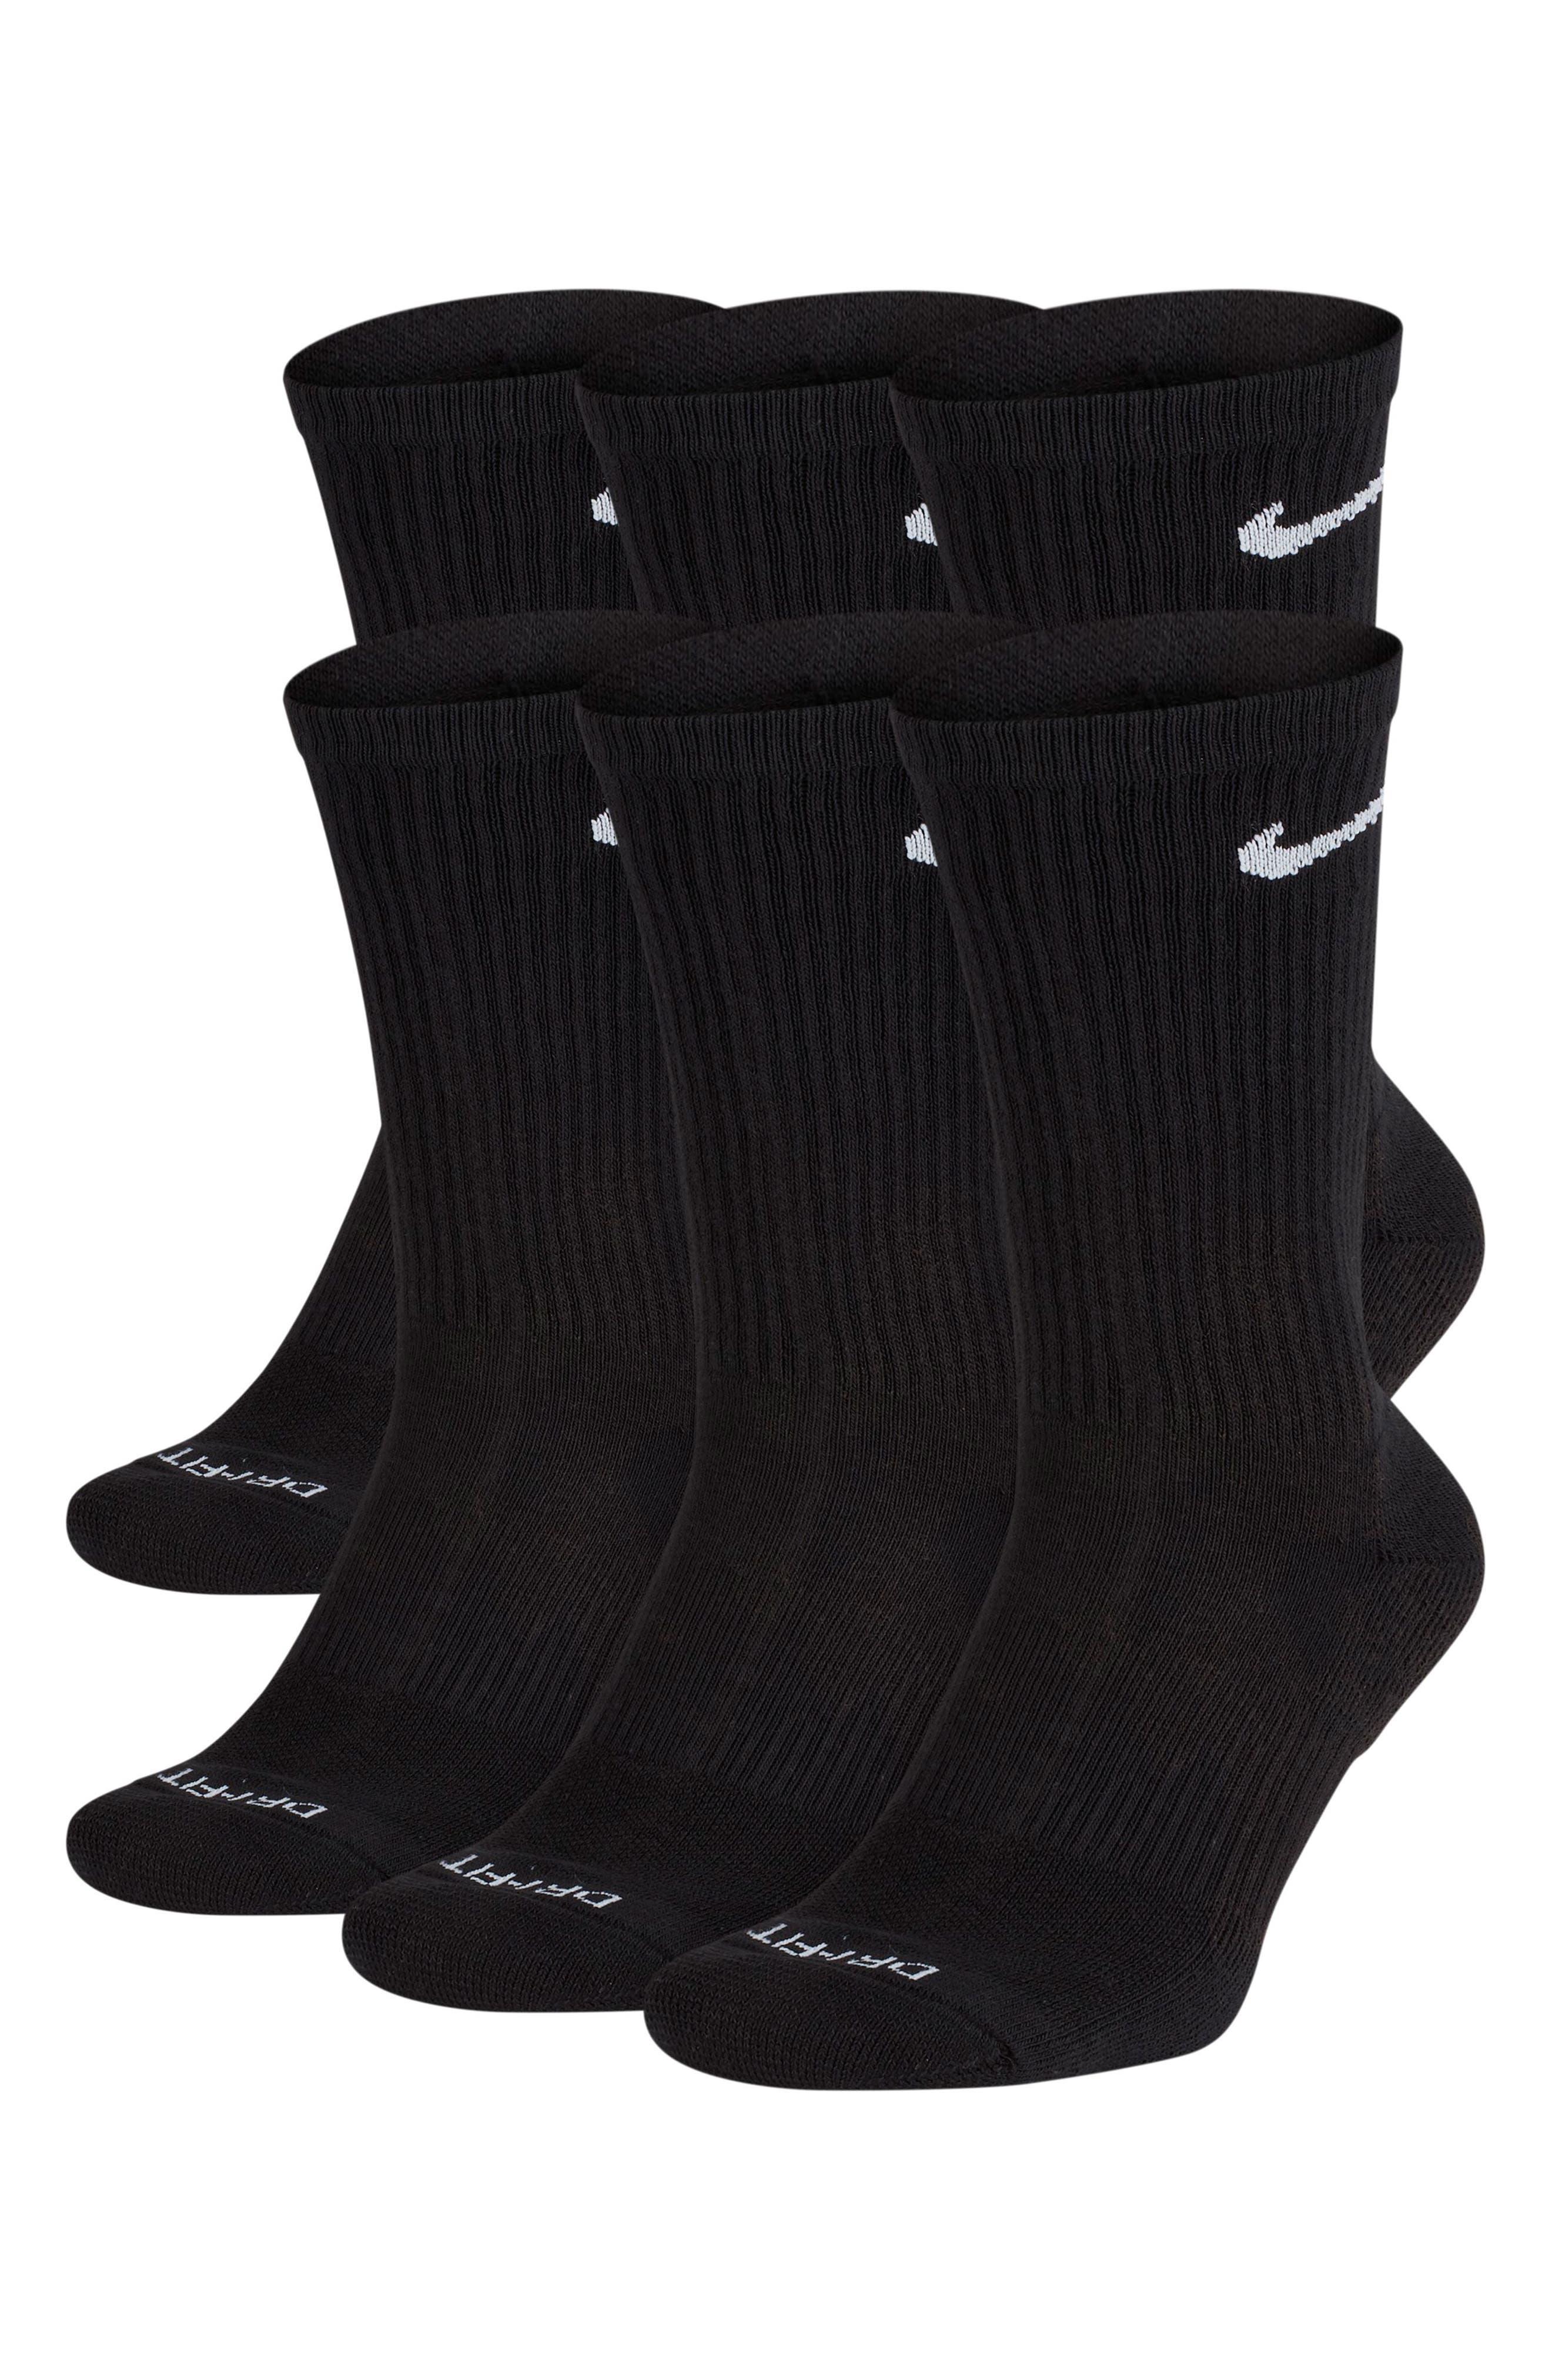 NIKE, Dry 6-Pack Everyday Plus Cushion Crew Training Socks, Main thumbnail 1, color, BLACK/ WHITE